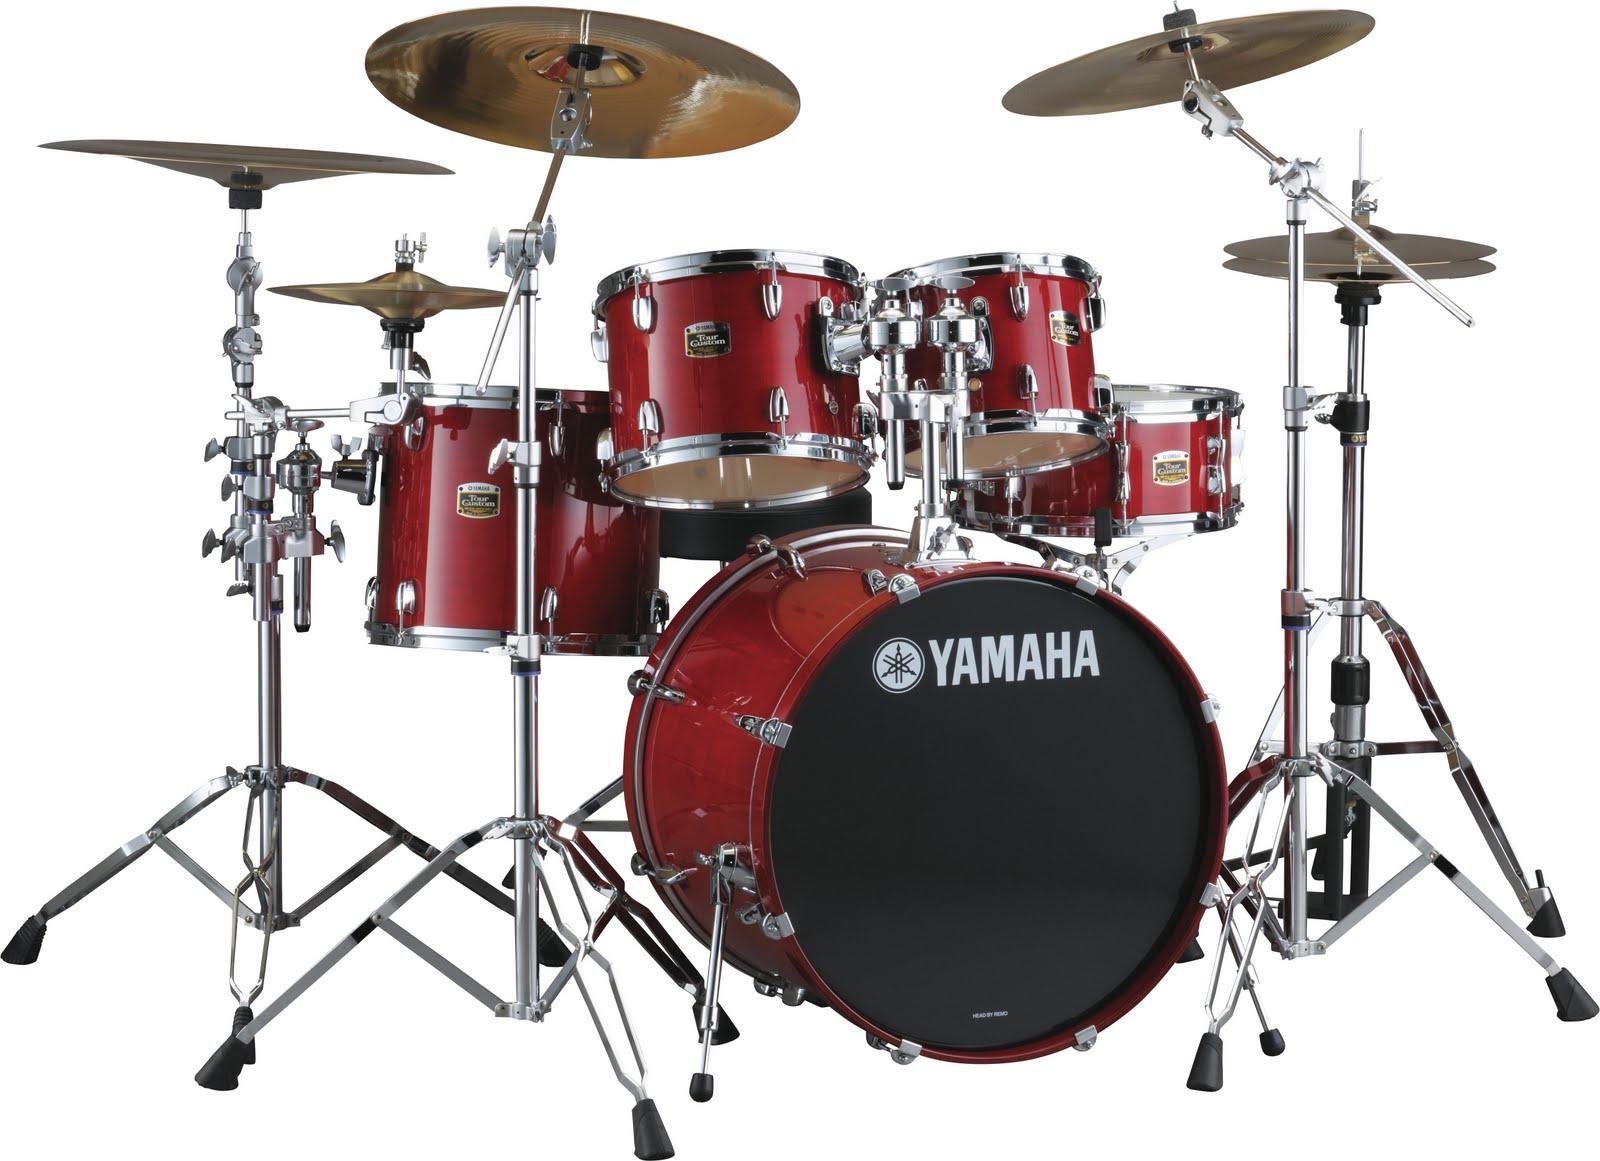 Yamaha Tour Custom Series Drum Set